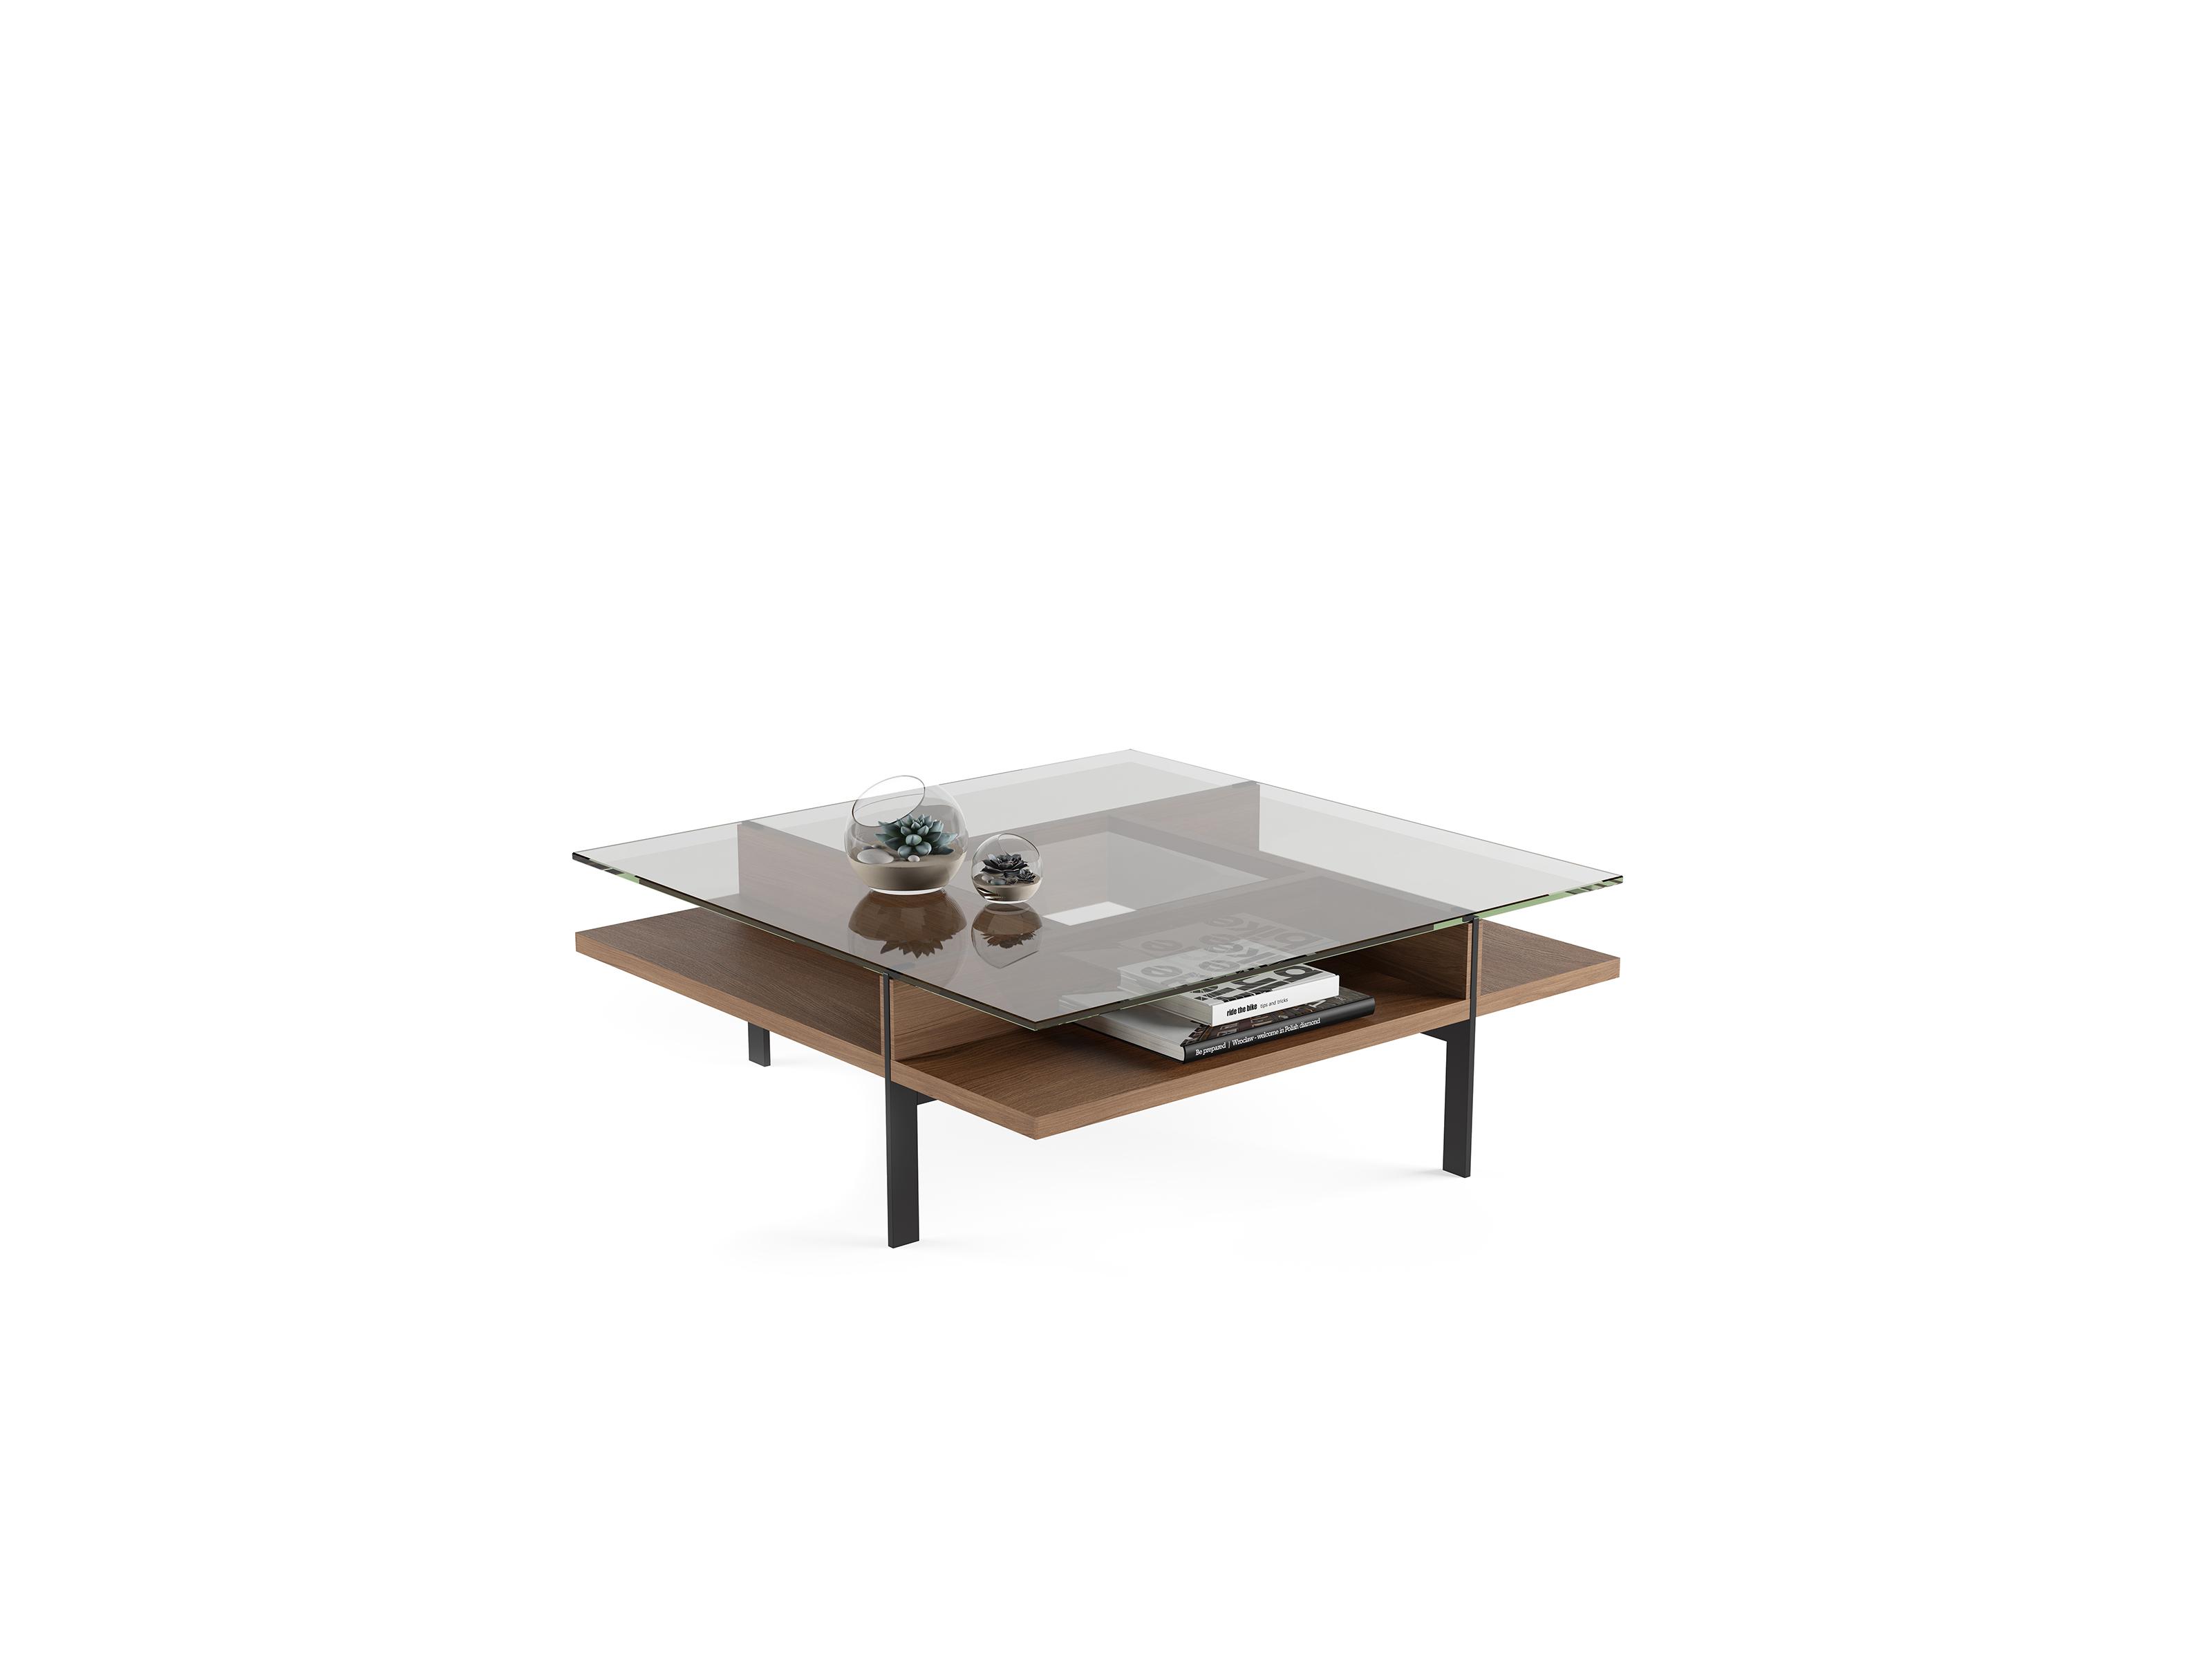 Terrace 1150 Modern Square Glass Coffee Table Bdi Furniture